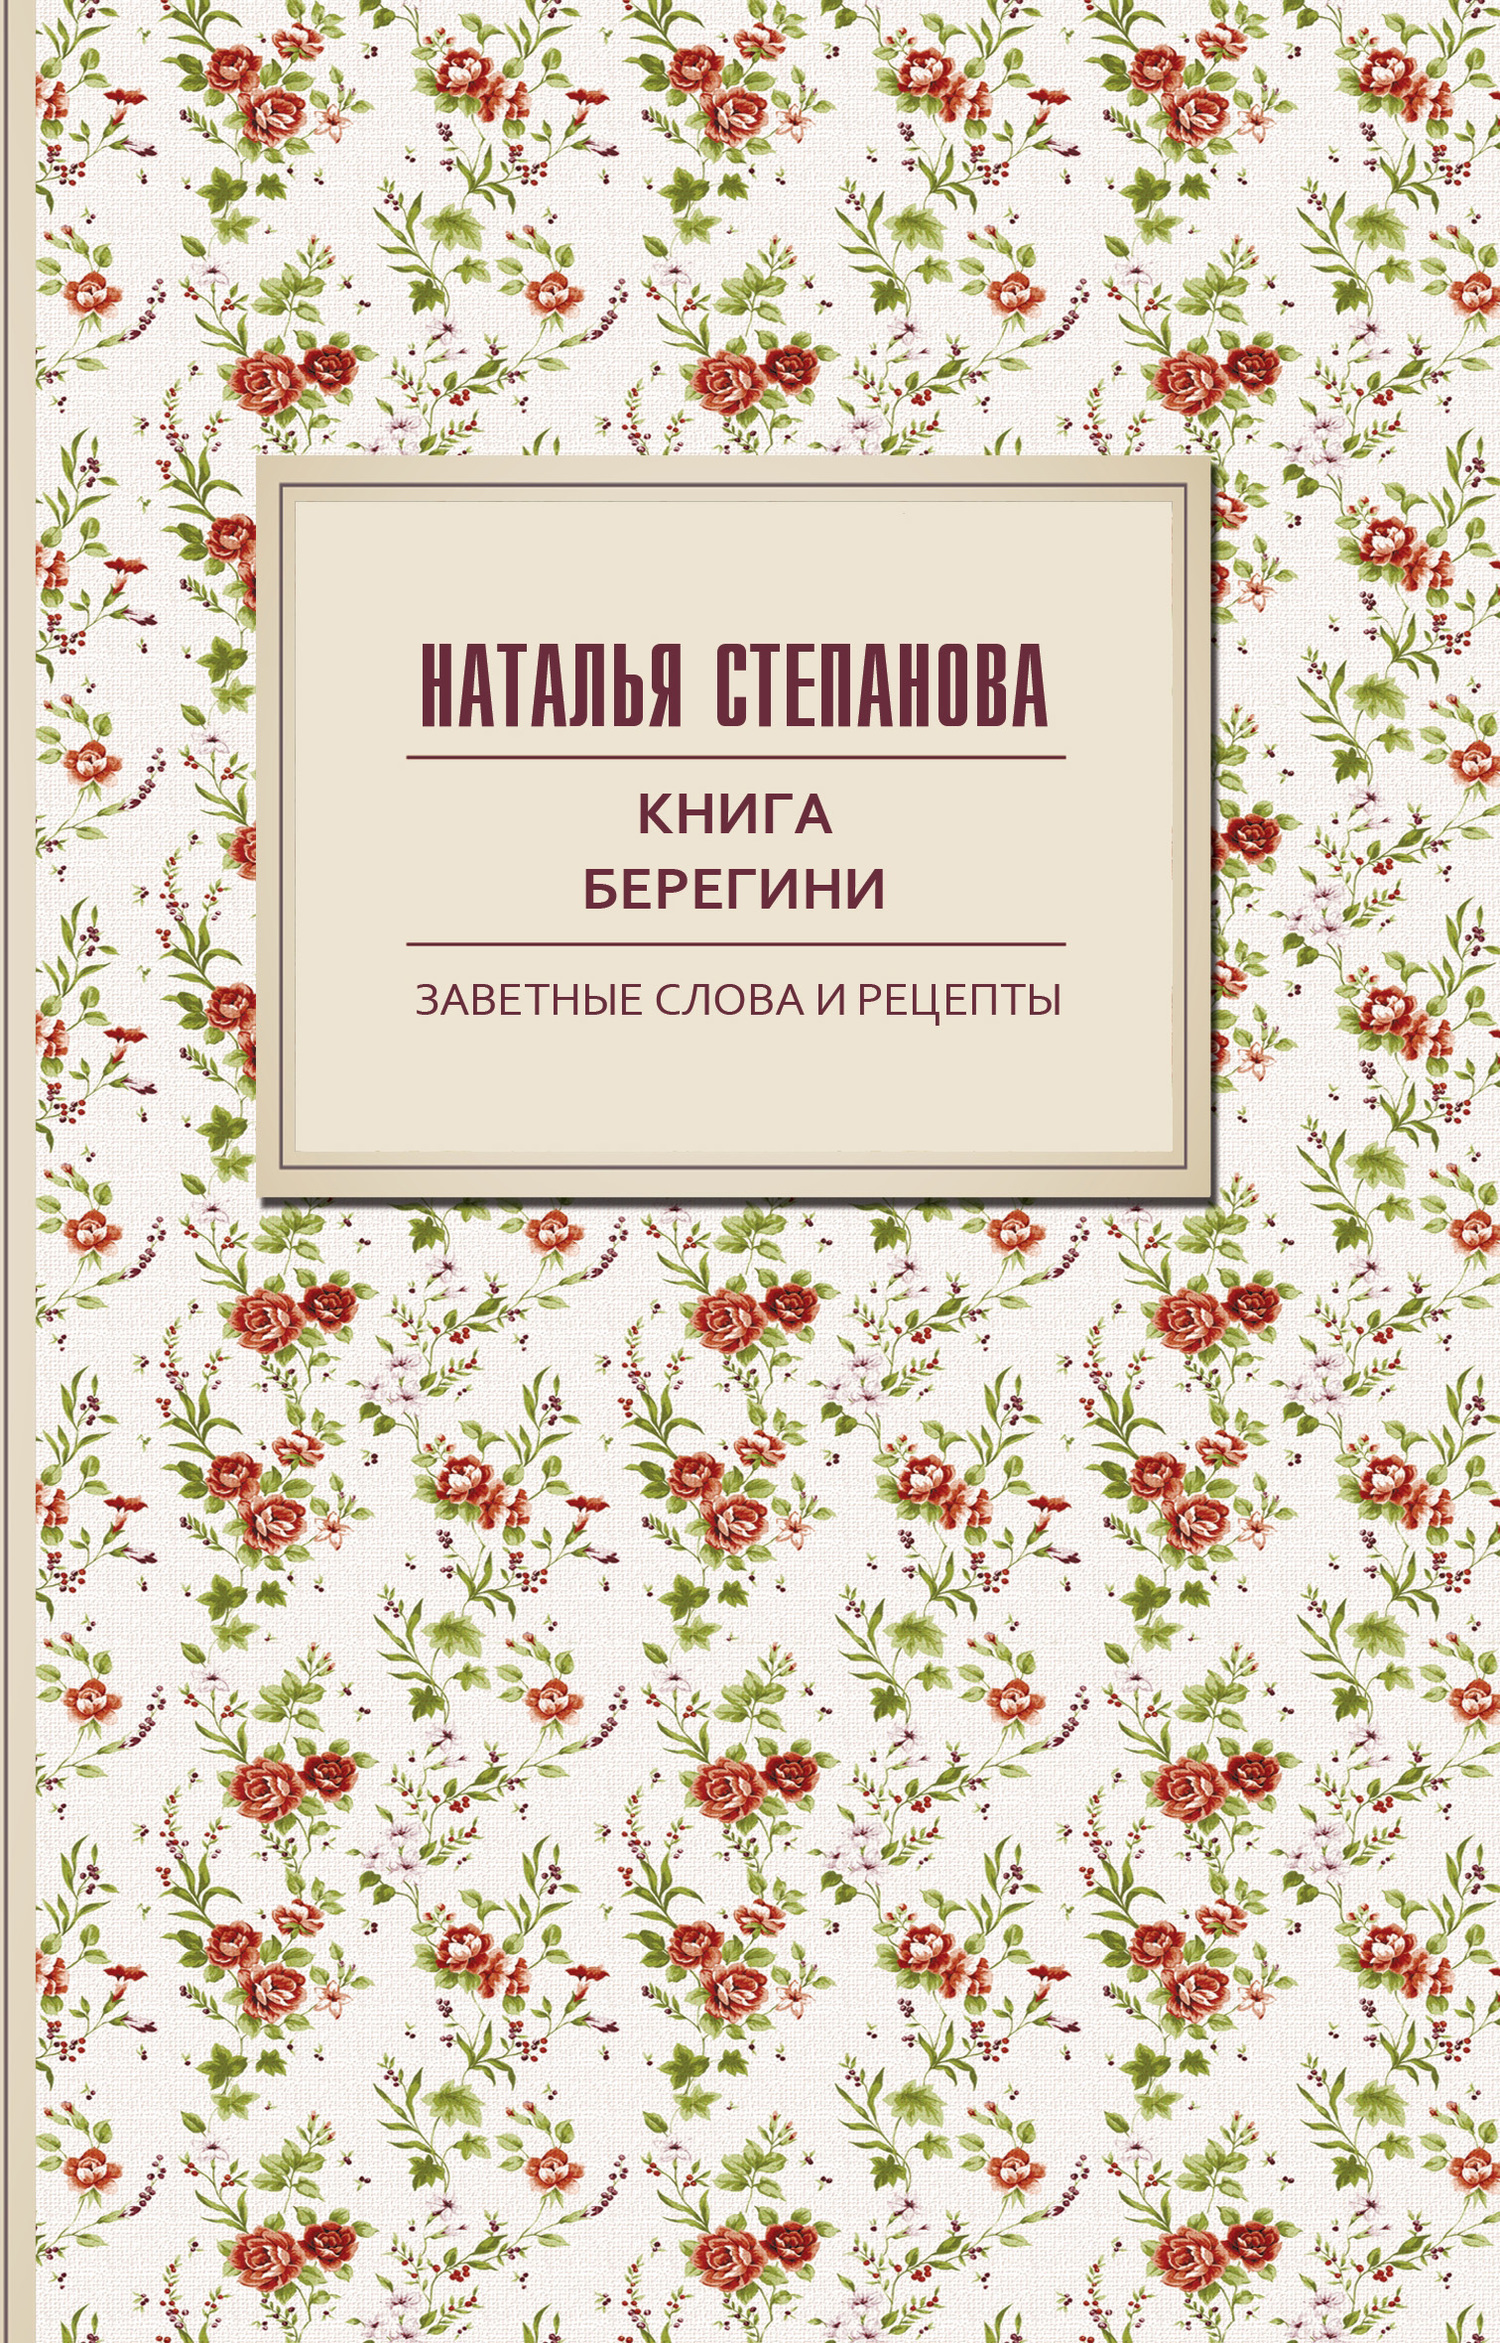 Книга берегини. Заветные слова и рецепты